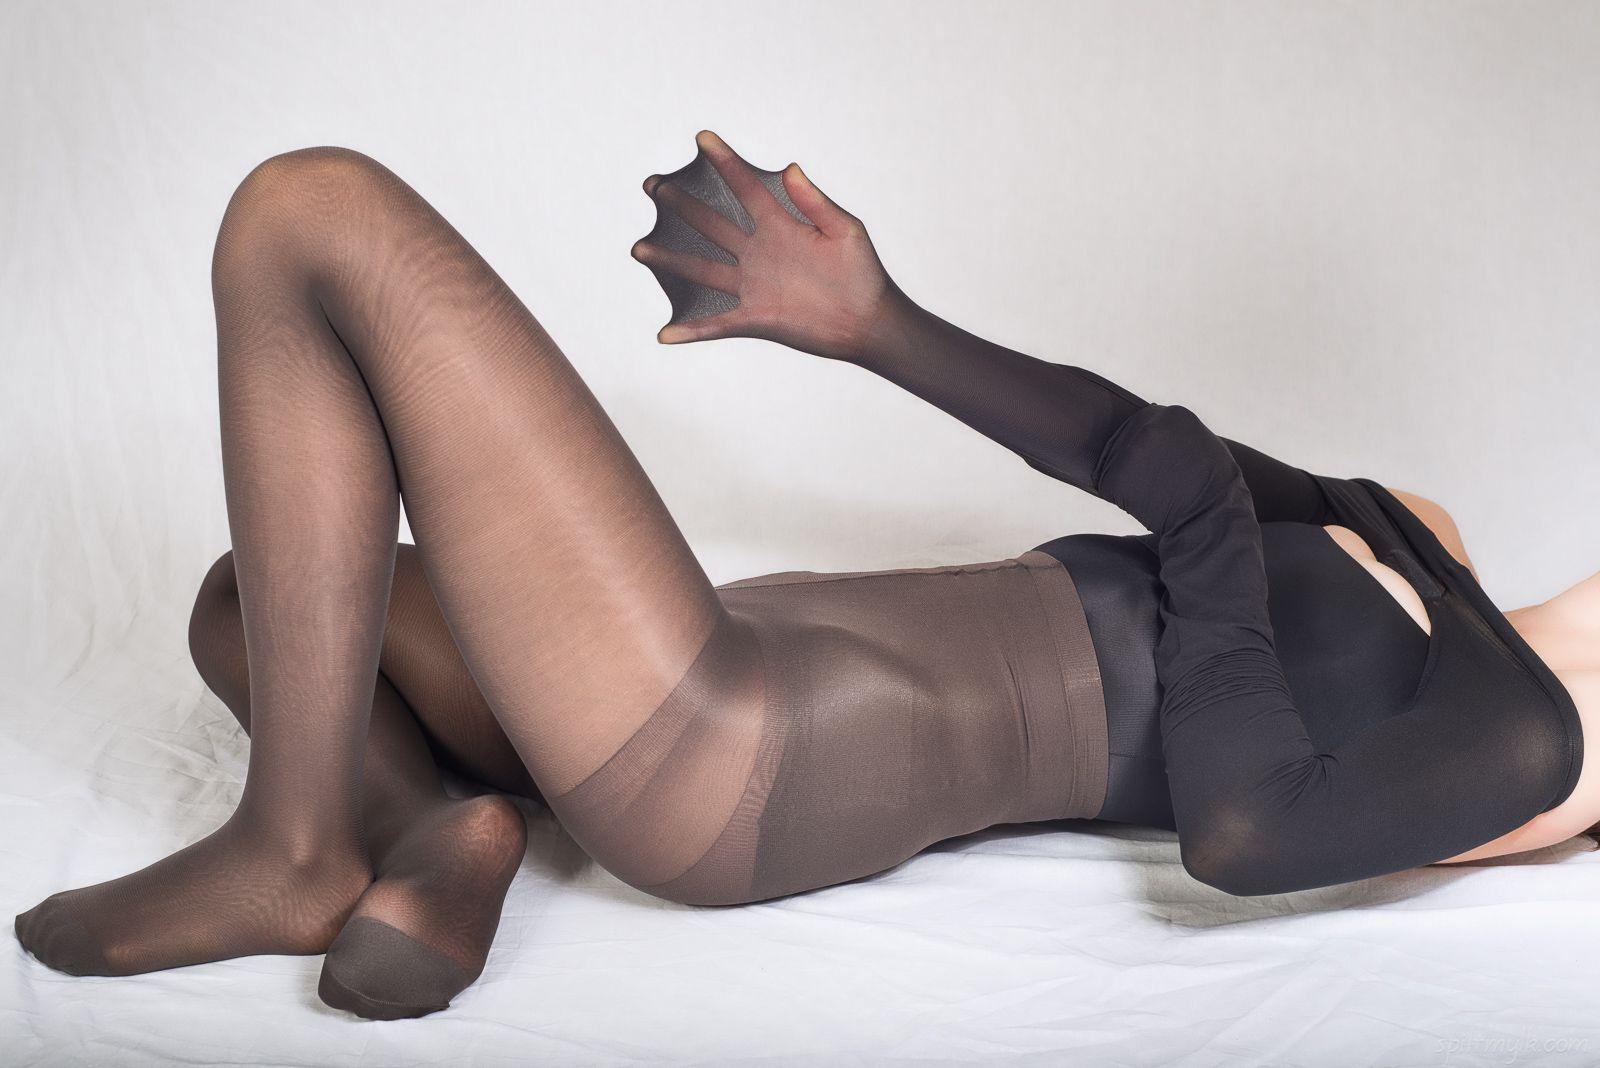 Annette art pantyhose